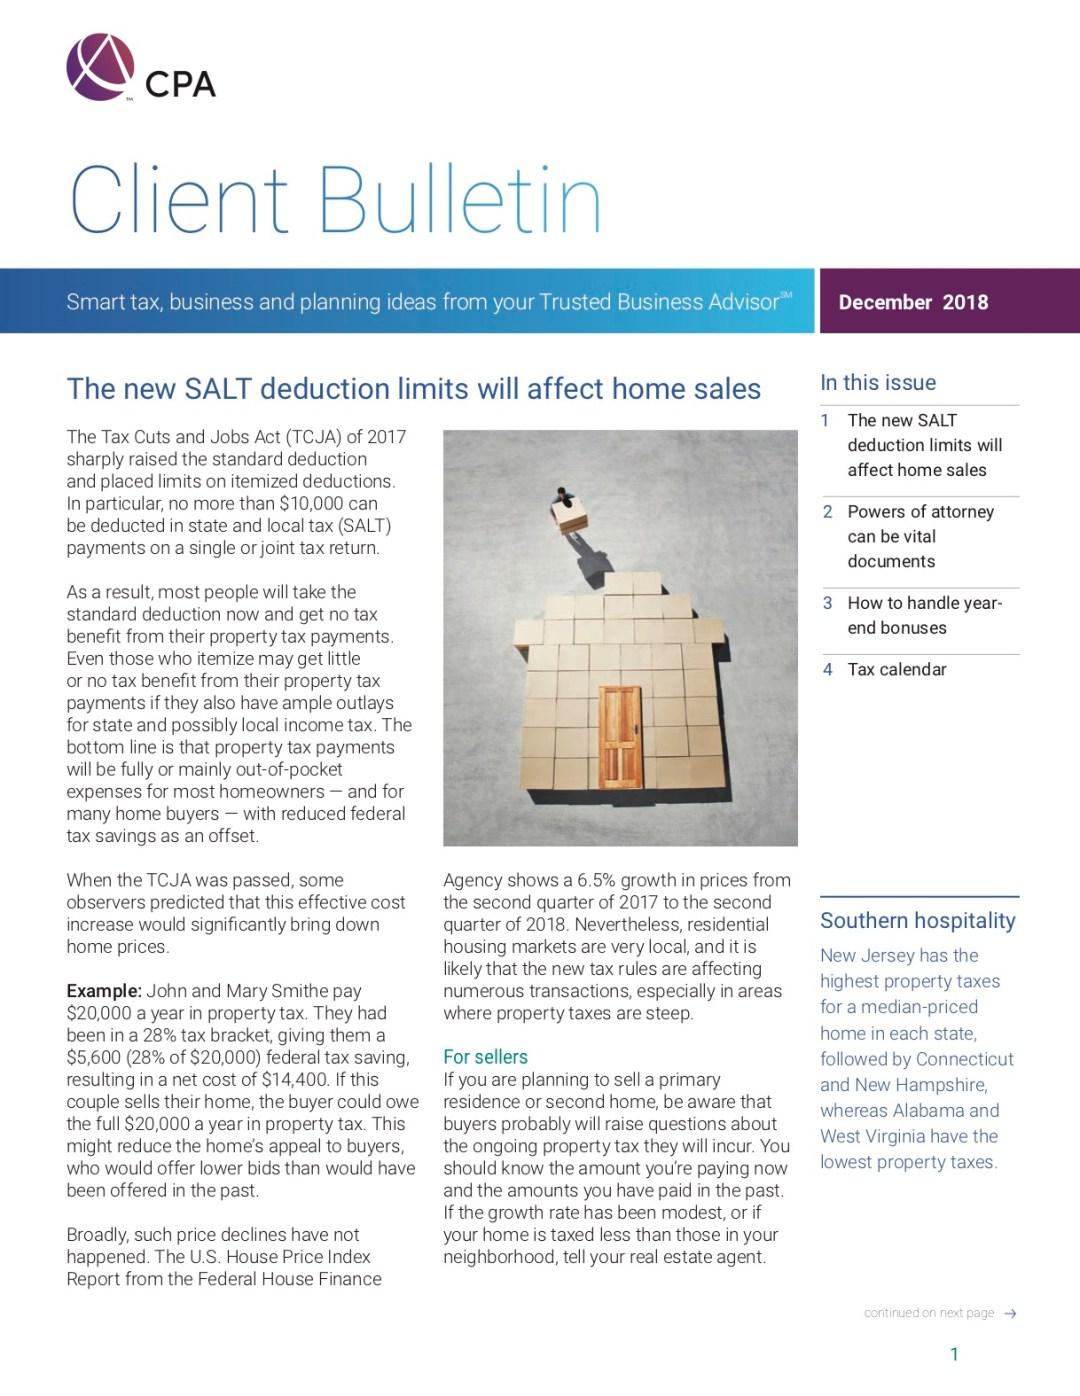 new SALT deduction limits, power of attorney, year-end bonuses, tax calendar